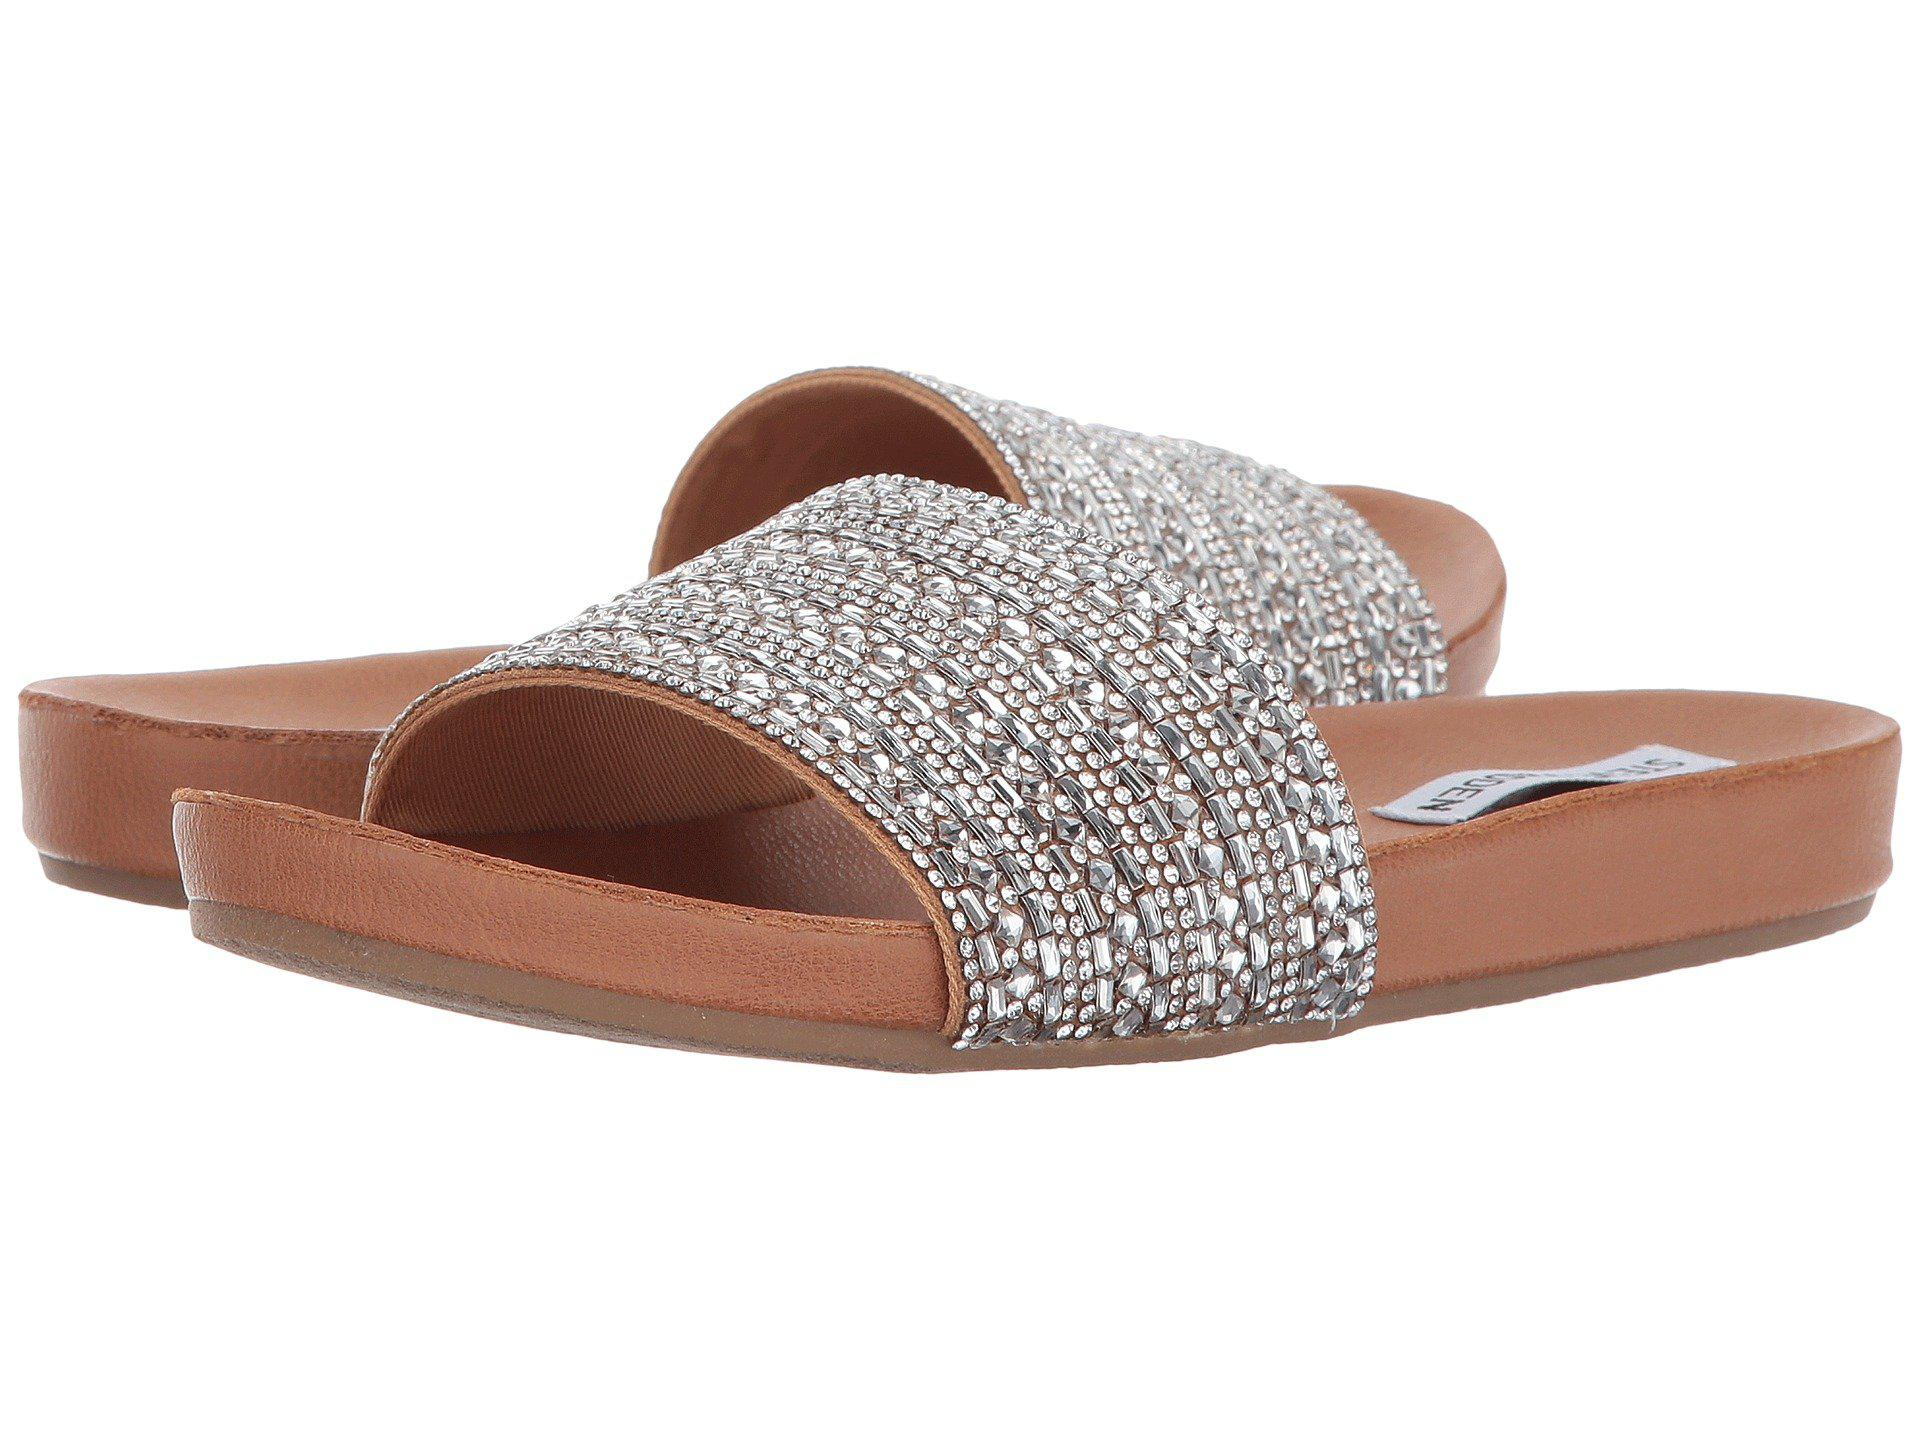 3f7494c39e8 Lyst - Steve Madden Dazzle Slide Sandal in Brown - Save 11%